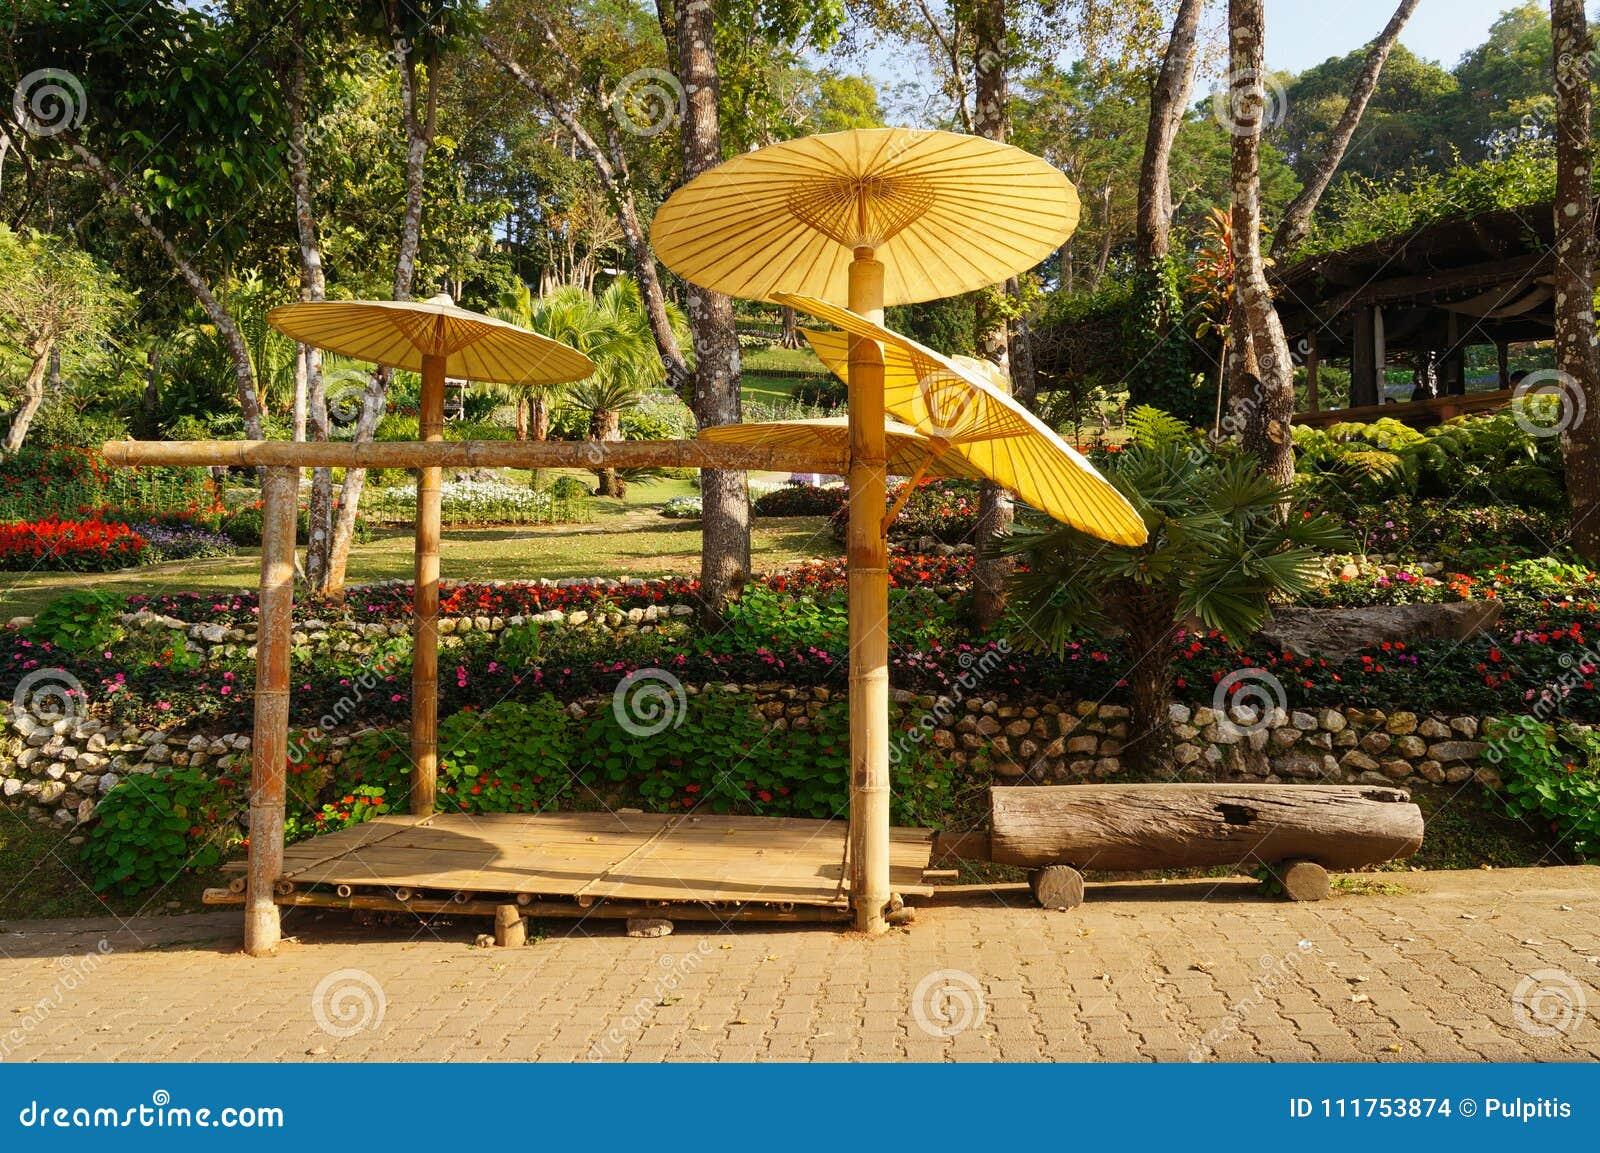 Paper Umbrellas In The Garden, Thailand. Stock Photo - Image of ...